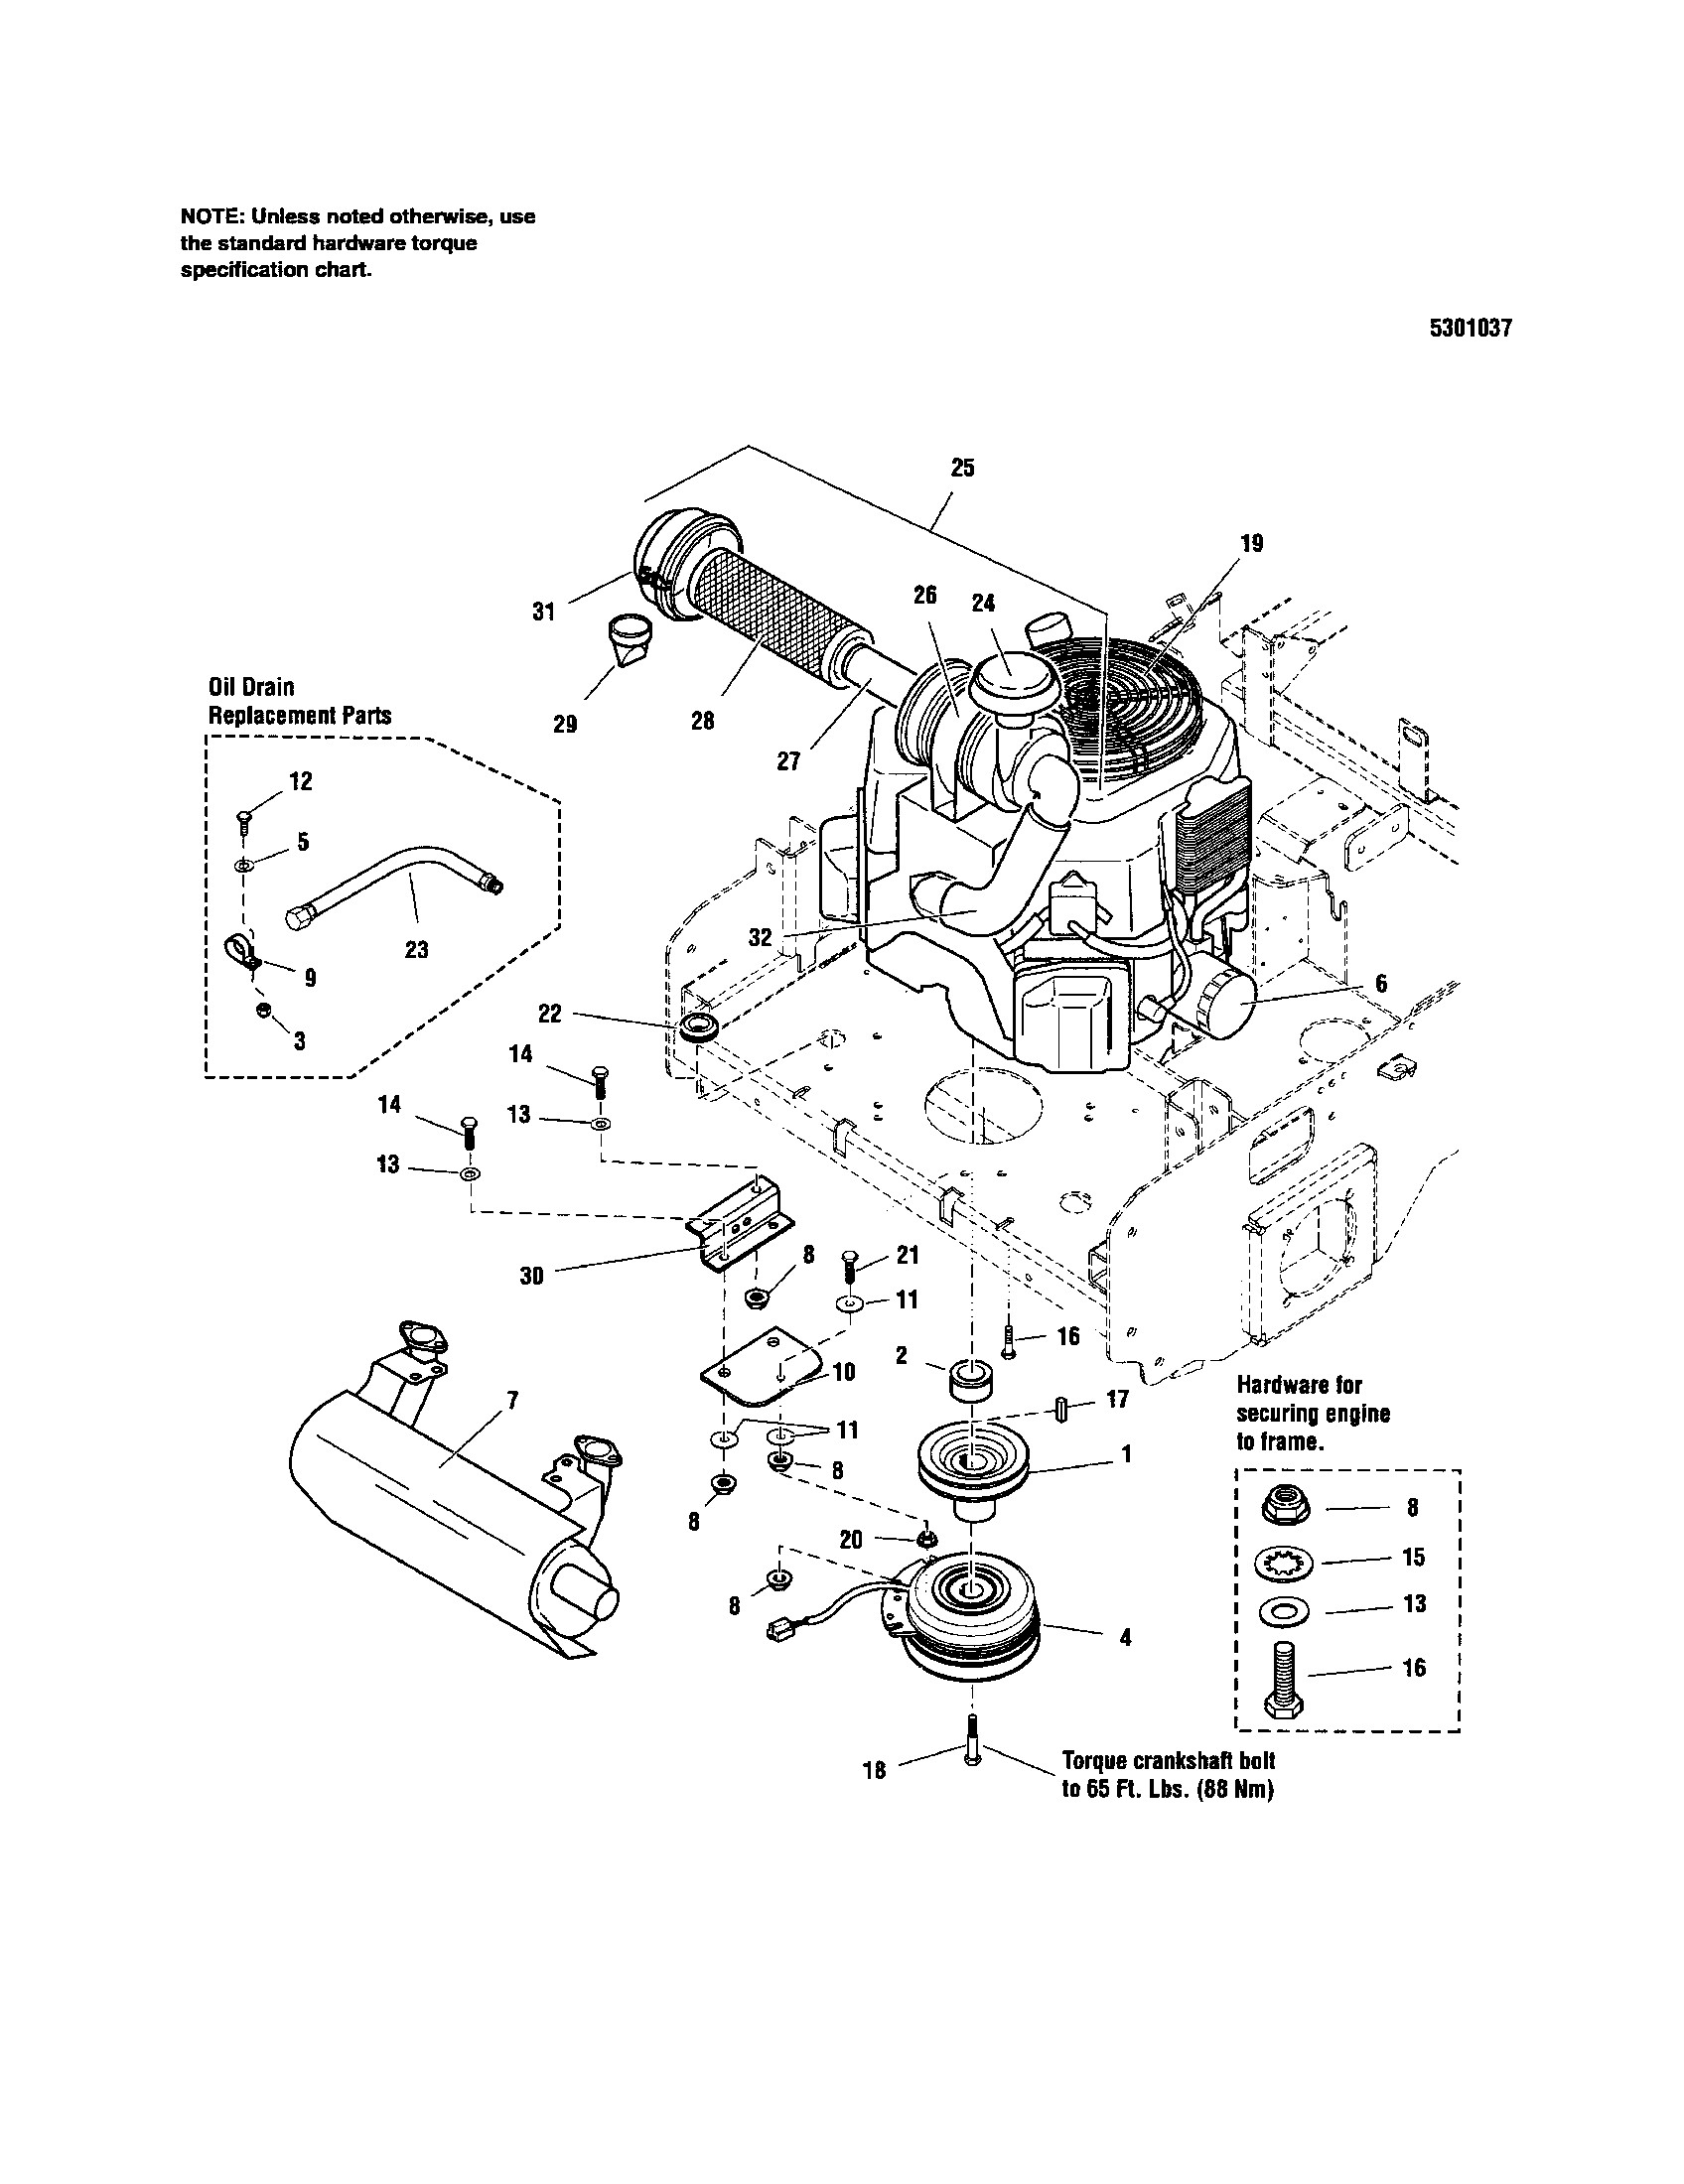 Kohler Engine Diagram Ask Answer Wiring. First Hp Kohler Engine Diagram Enthusiast Wiring Diagrams Rh Hop3ba Wisemamablog. Wiring. Kohler Courage 26hp Engine Wiring Diagram At Scoala.co